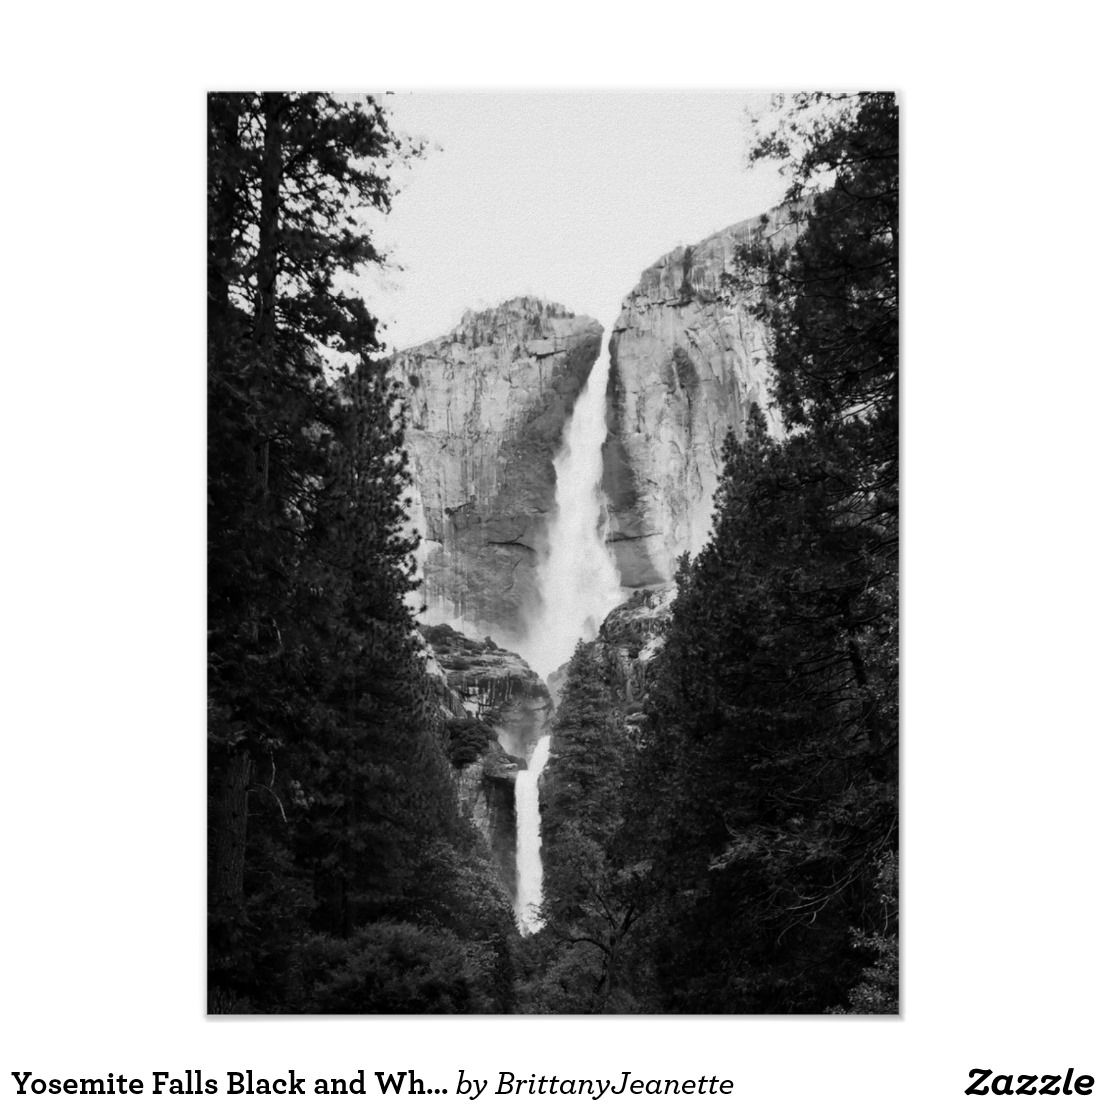 Yosemite Fall Poster: Yosemite Falls Black And White Poster